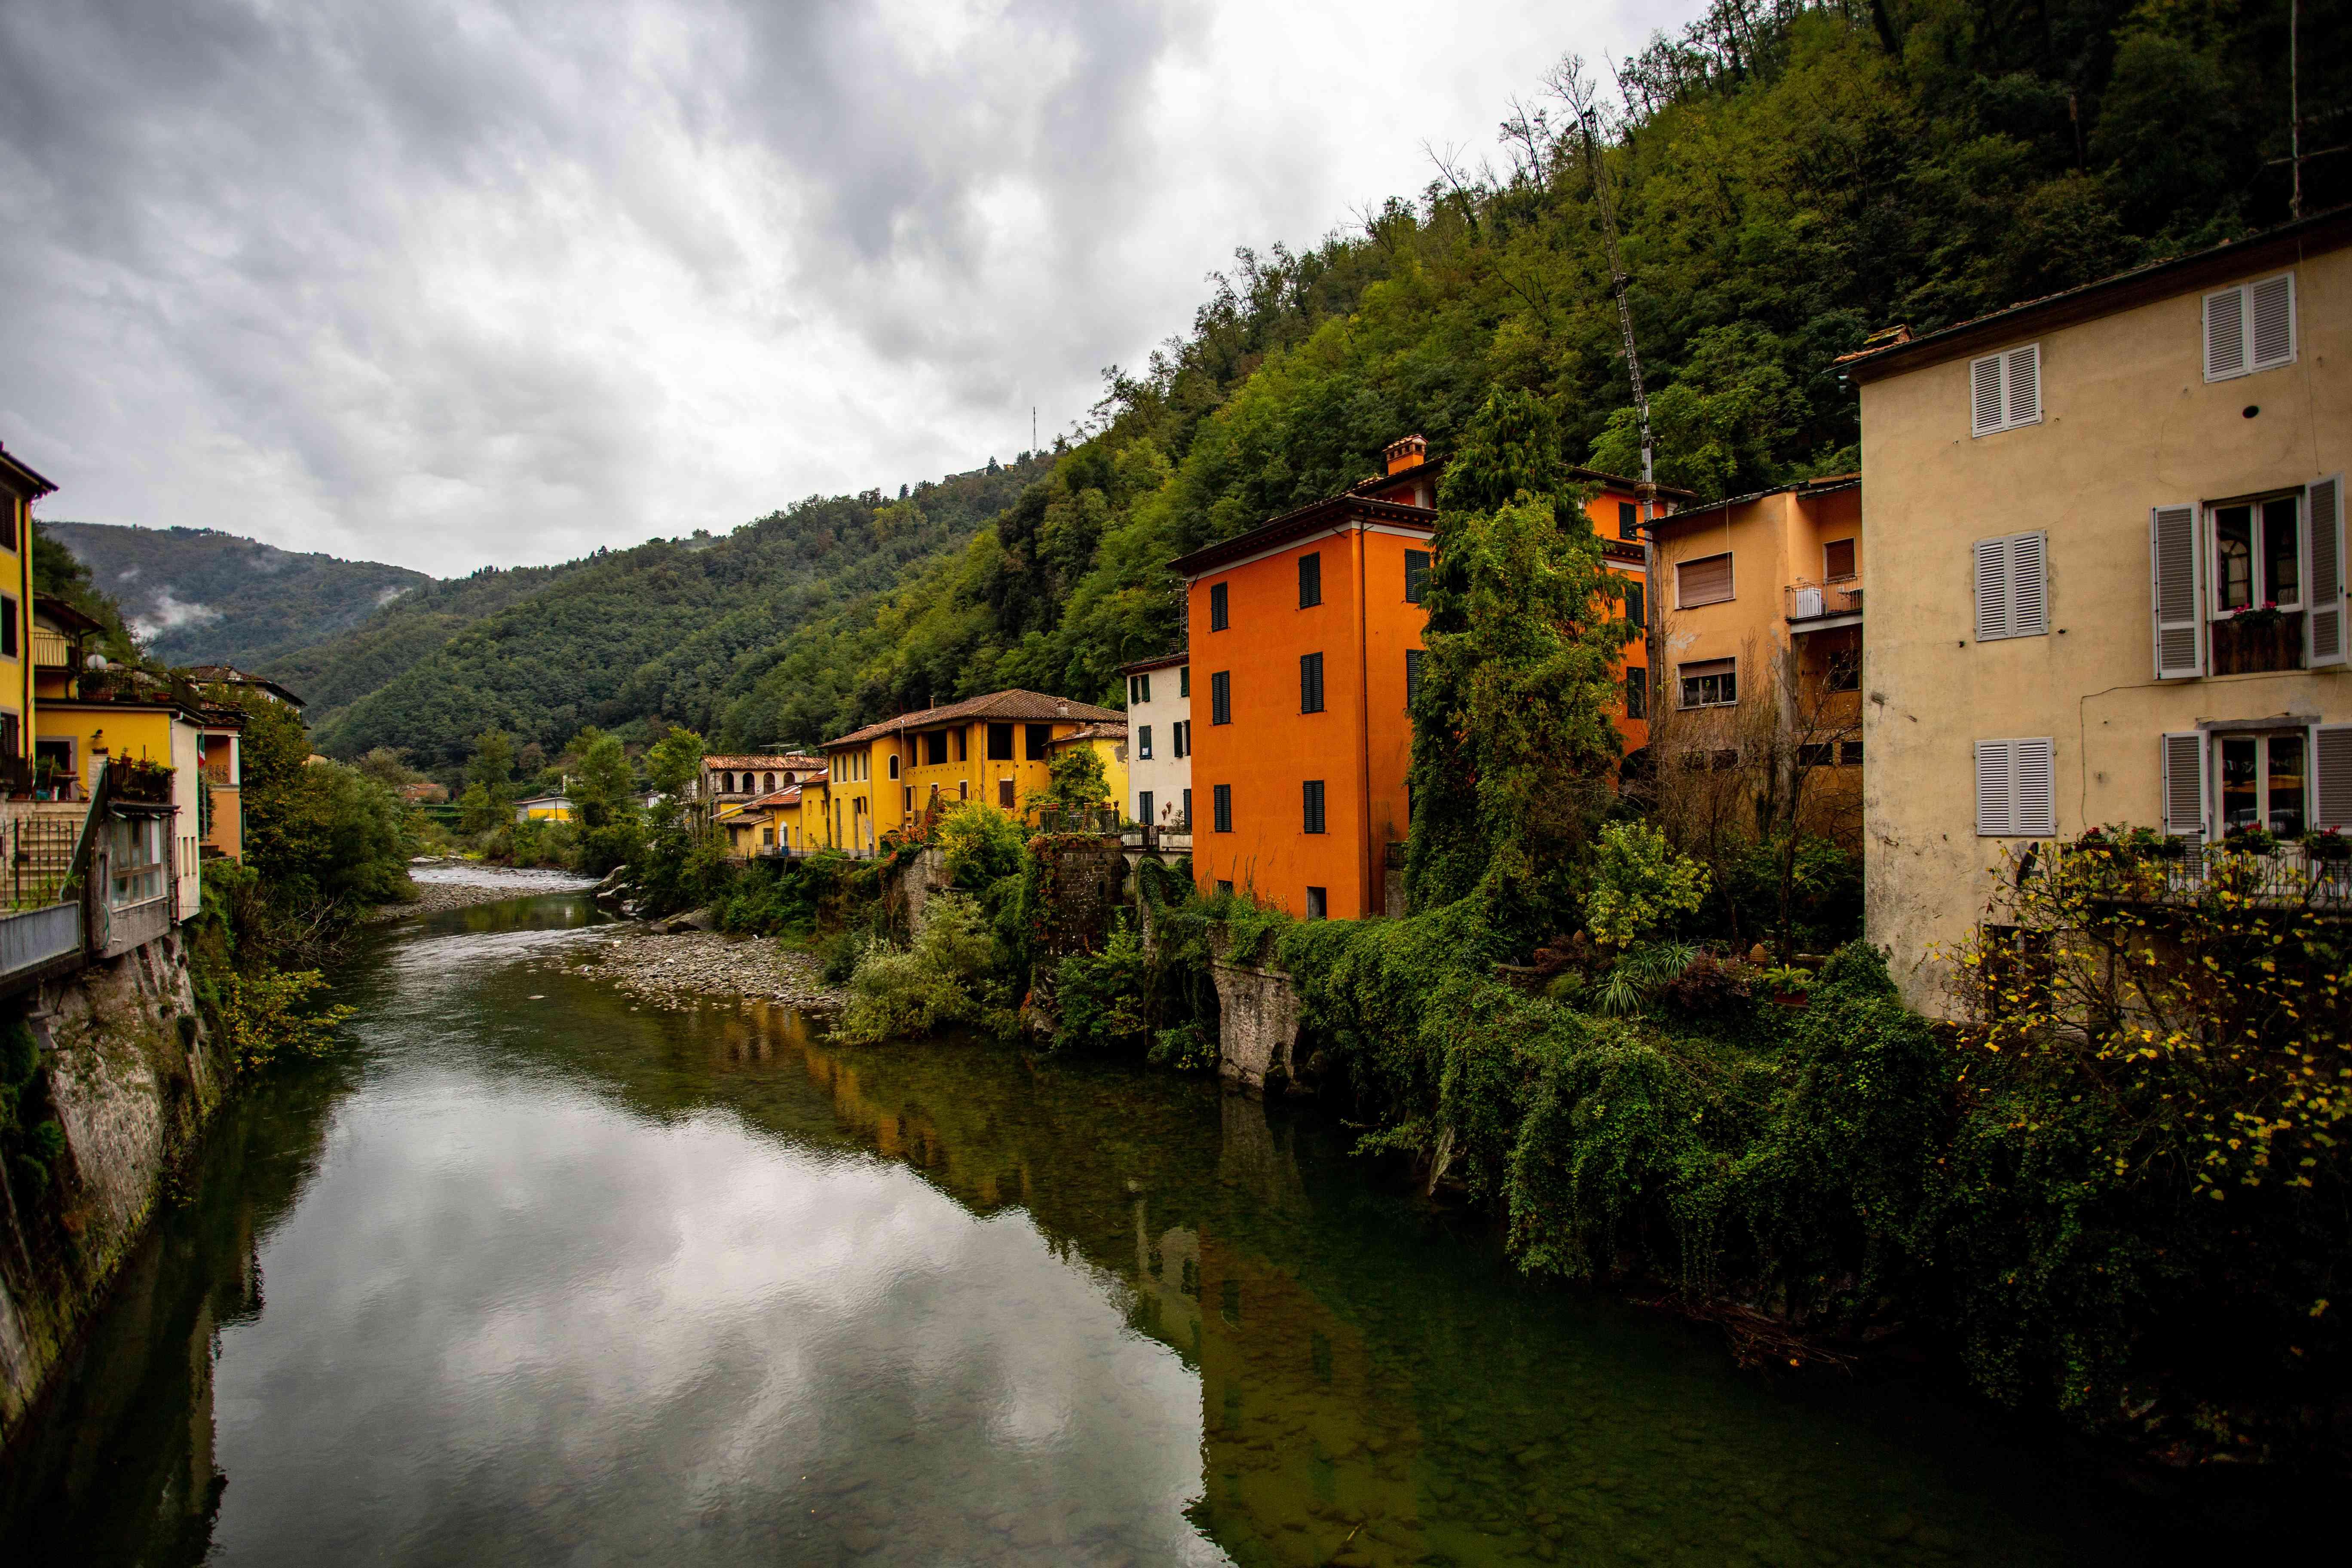 Bagni di Lucca, Italy